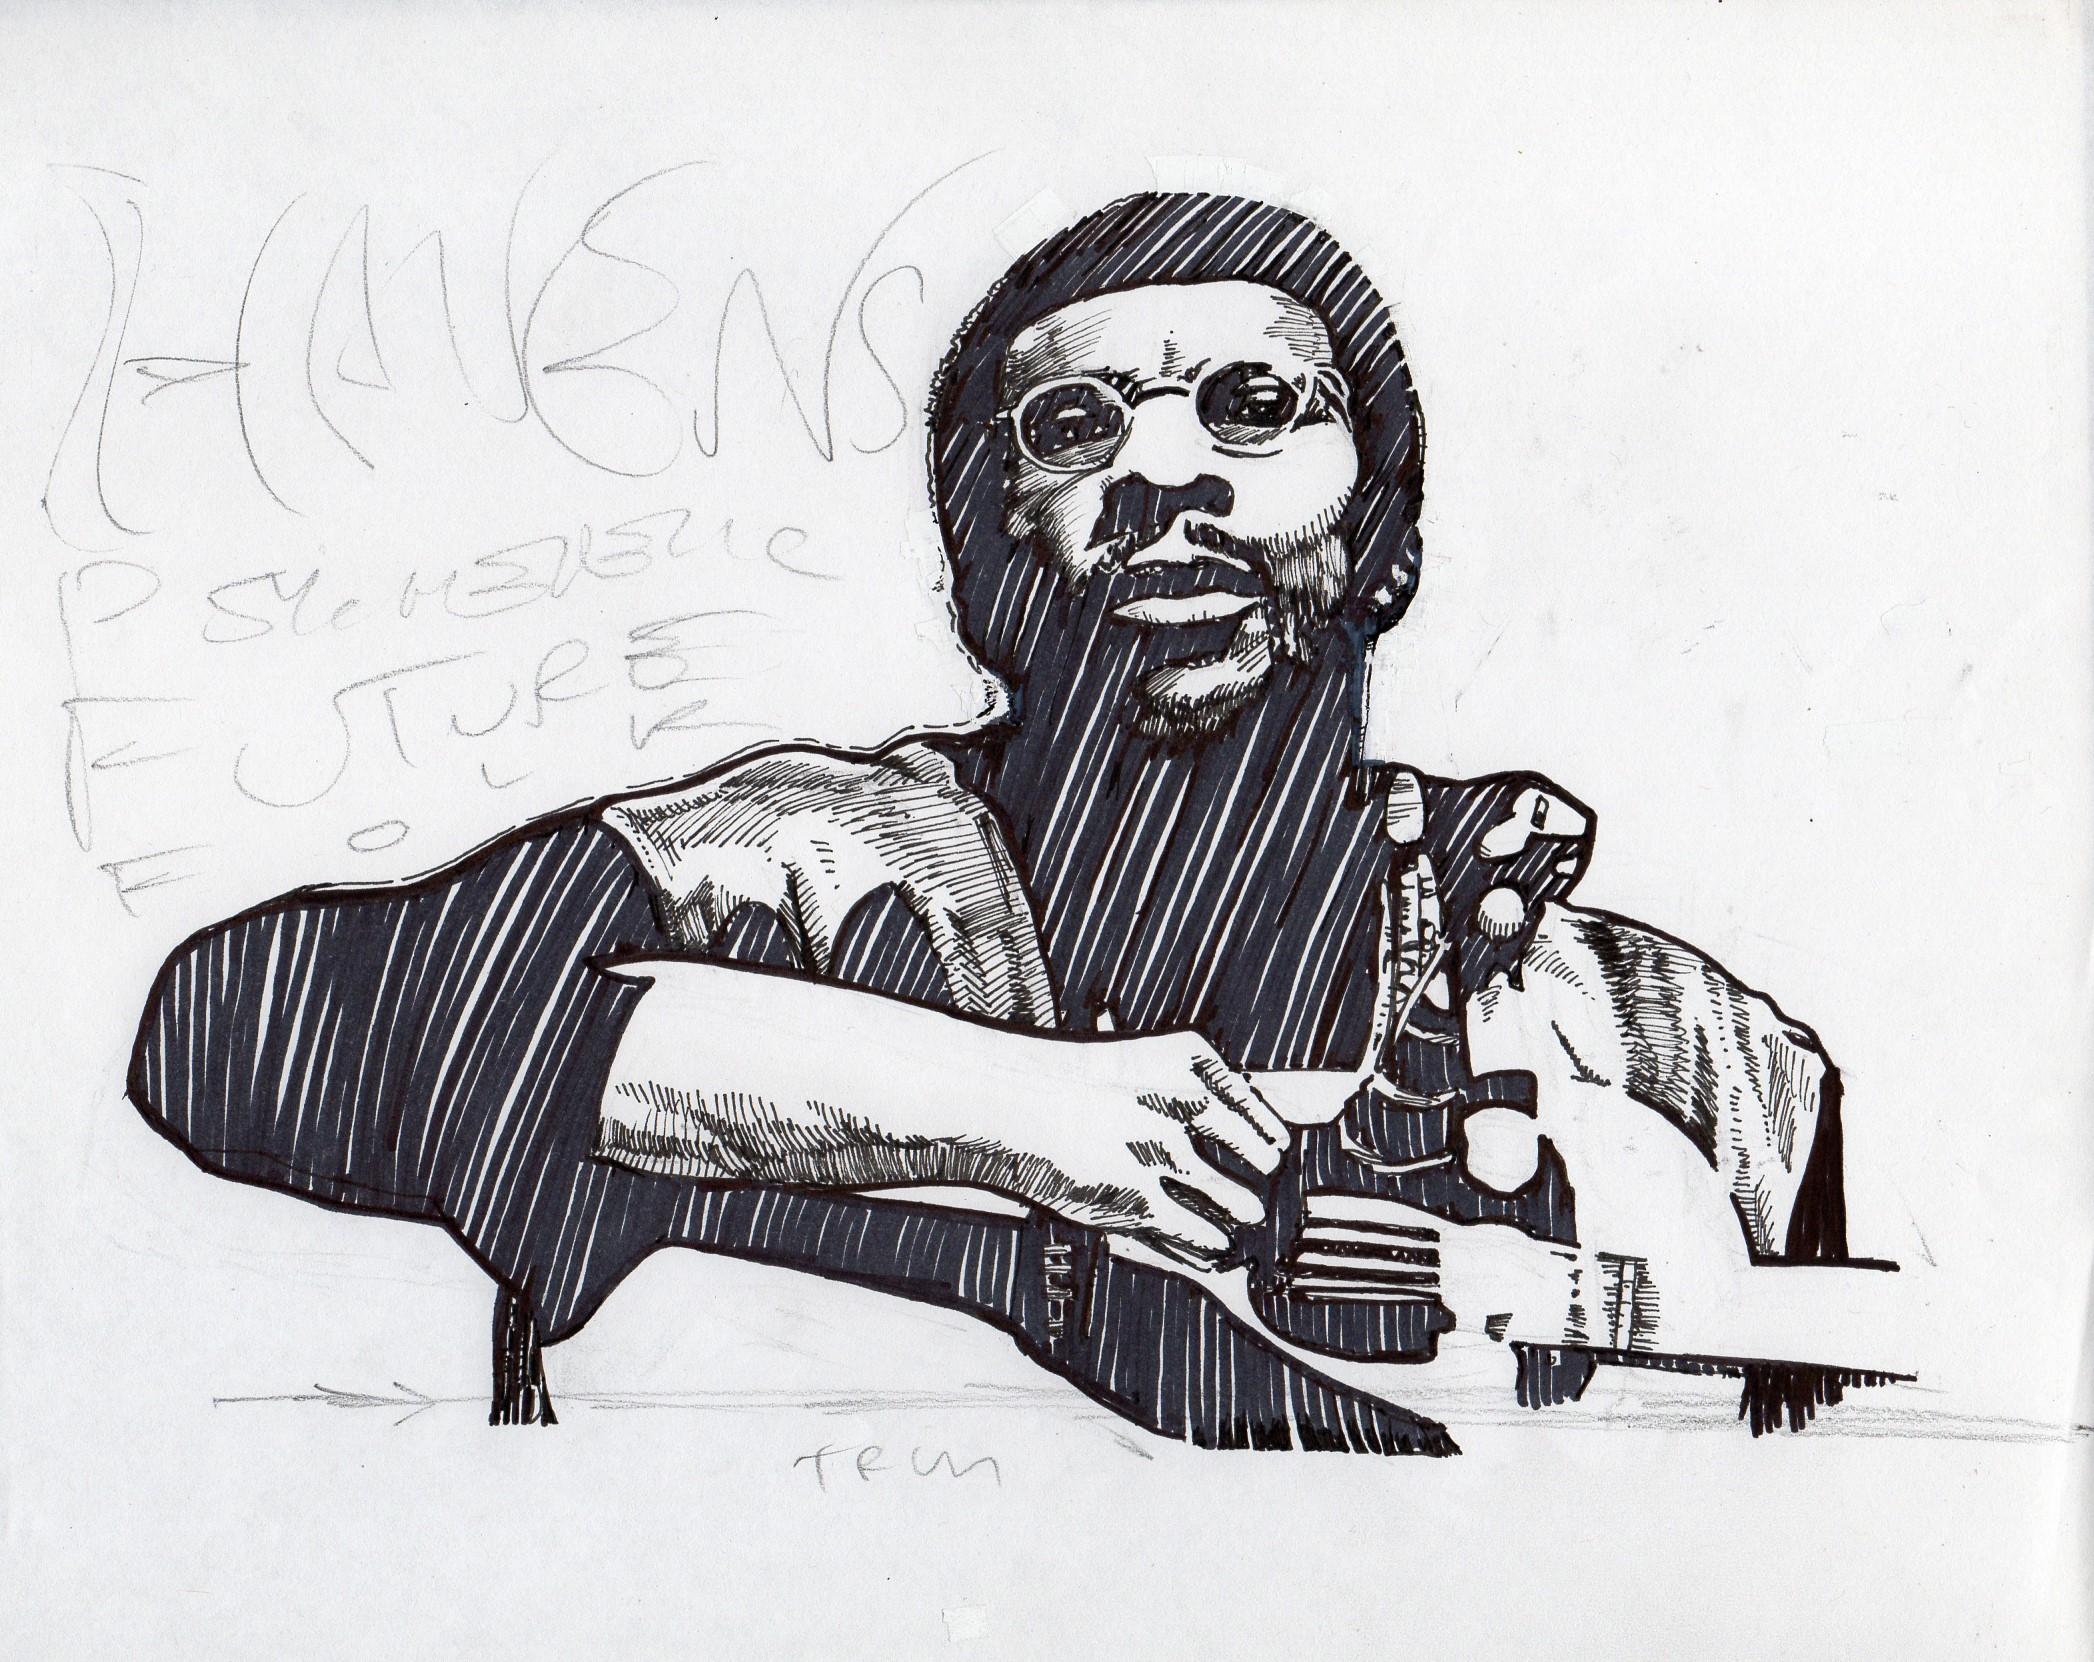 $250, Richie Havens plus sketch for GZD